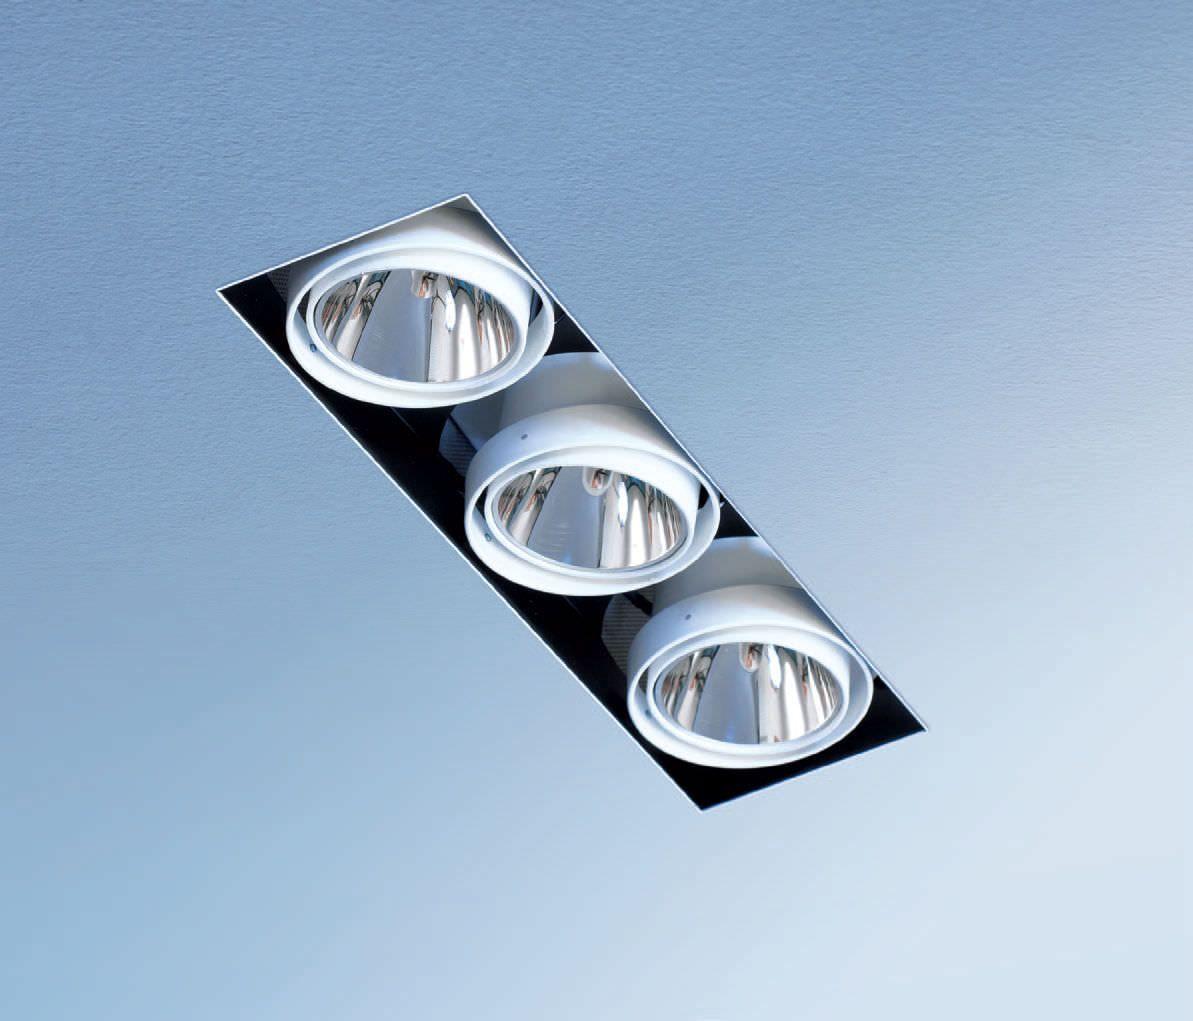 Spot Led Plafond Top Spot Plafond Cuisine Spots Cuisine